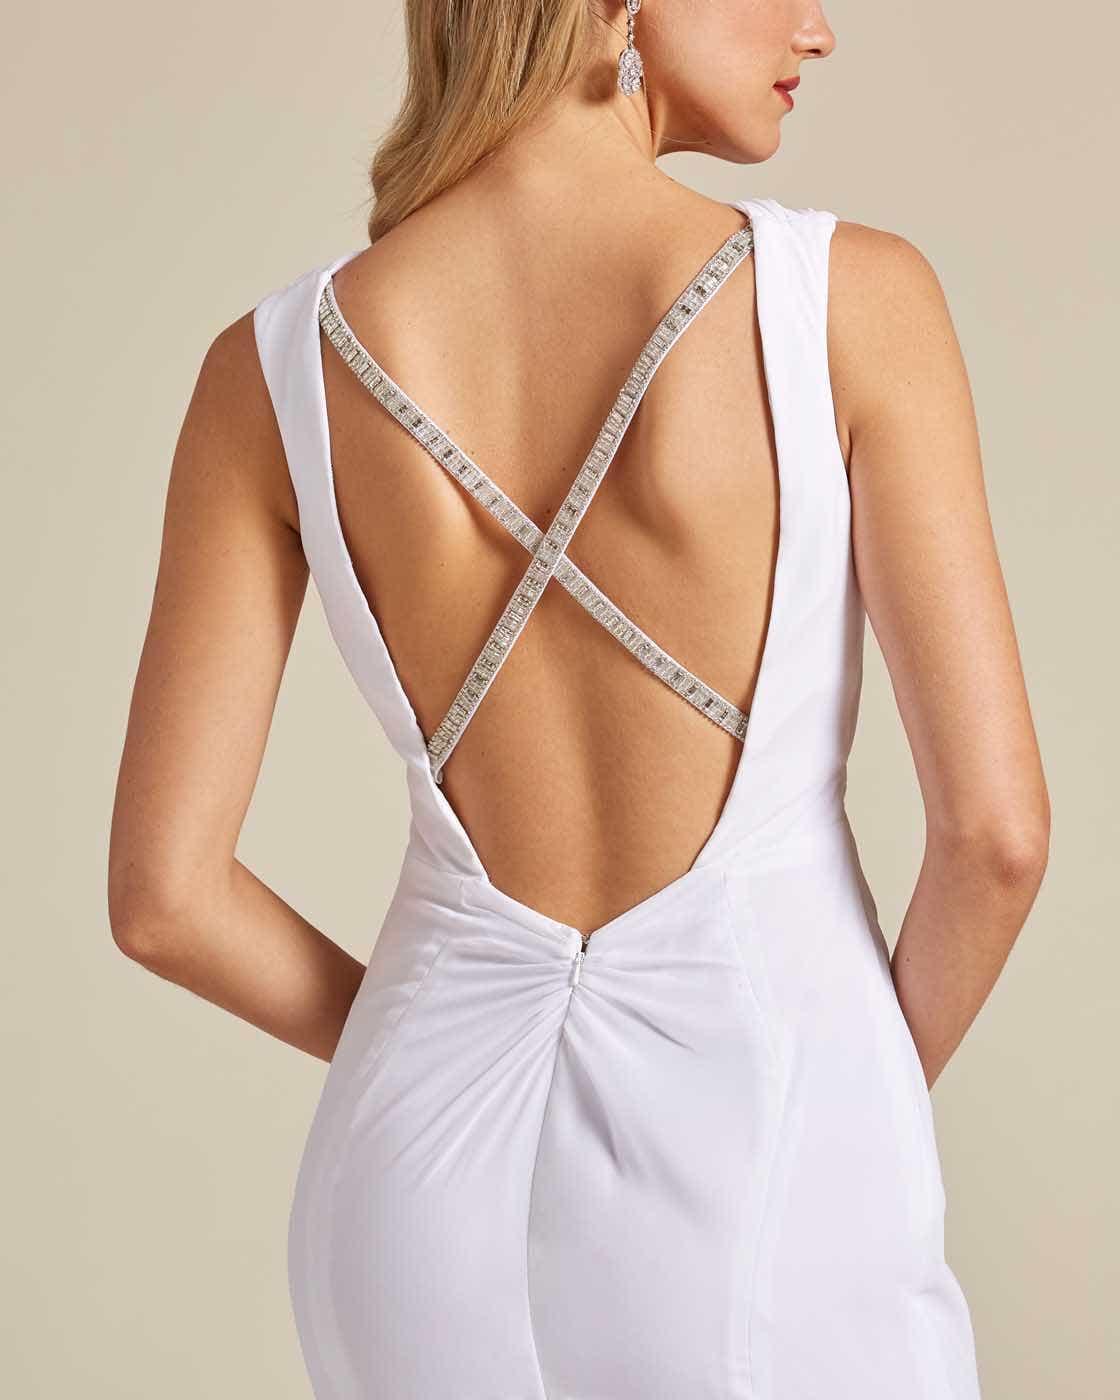 Ivory White Criss Cross Wedding Dress - Detail